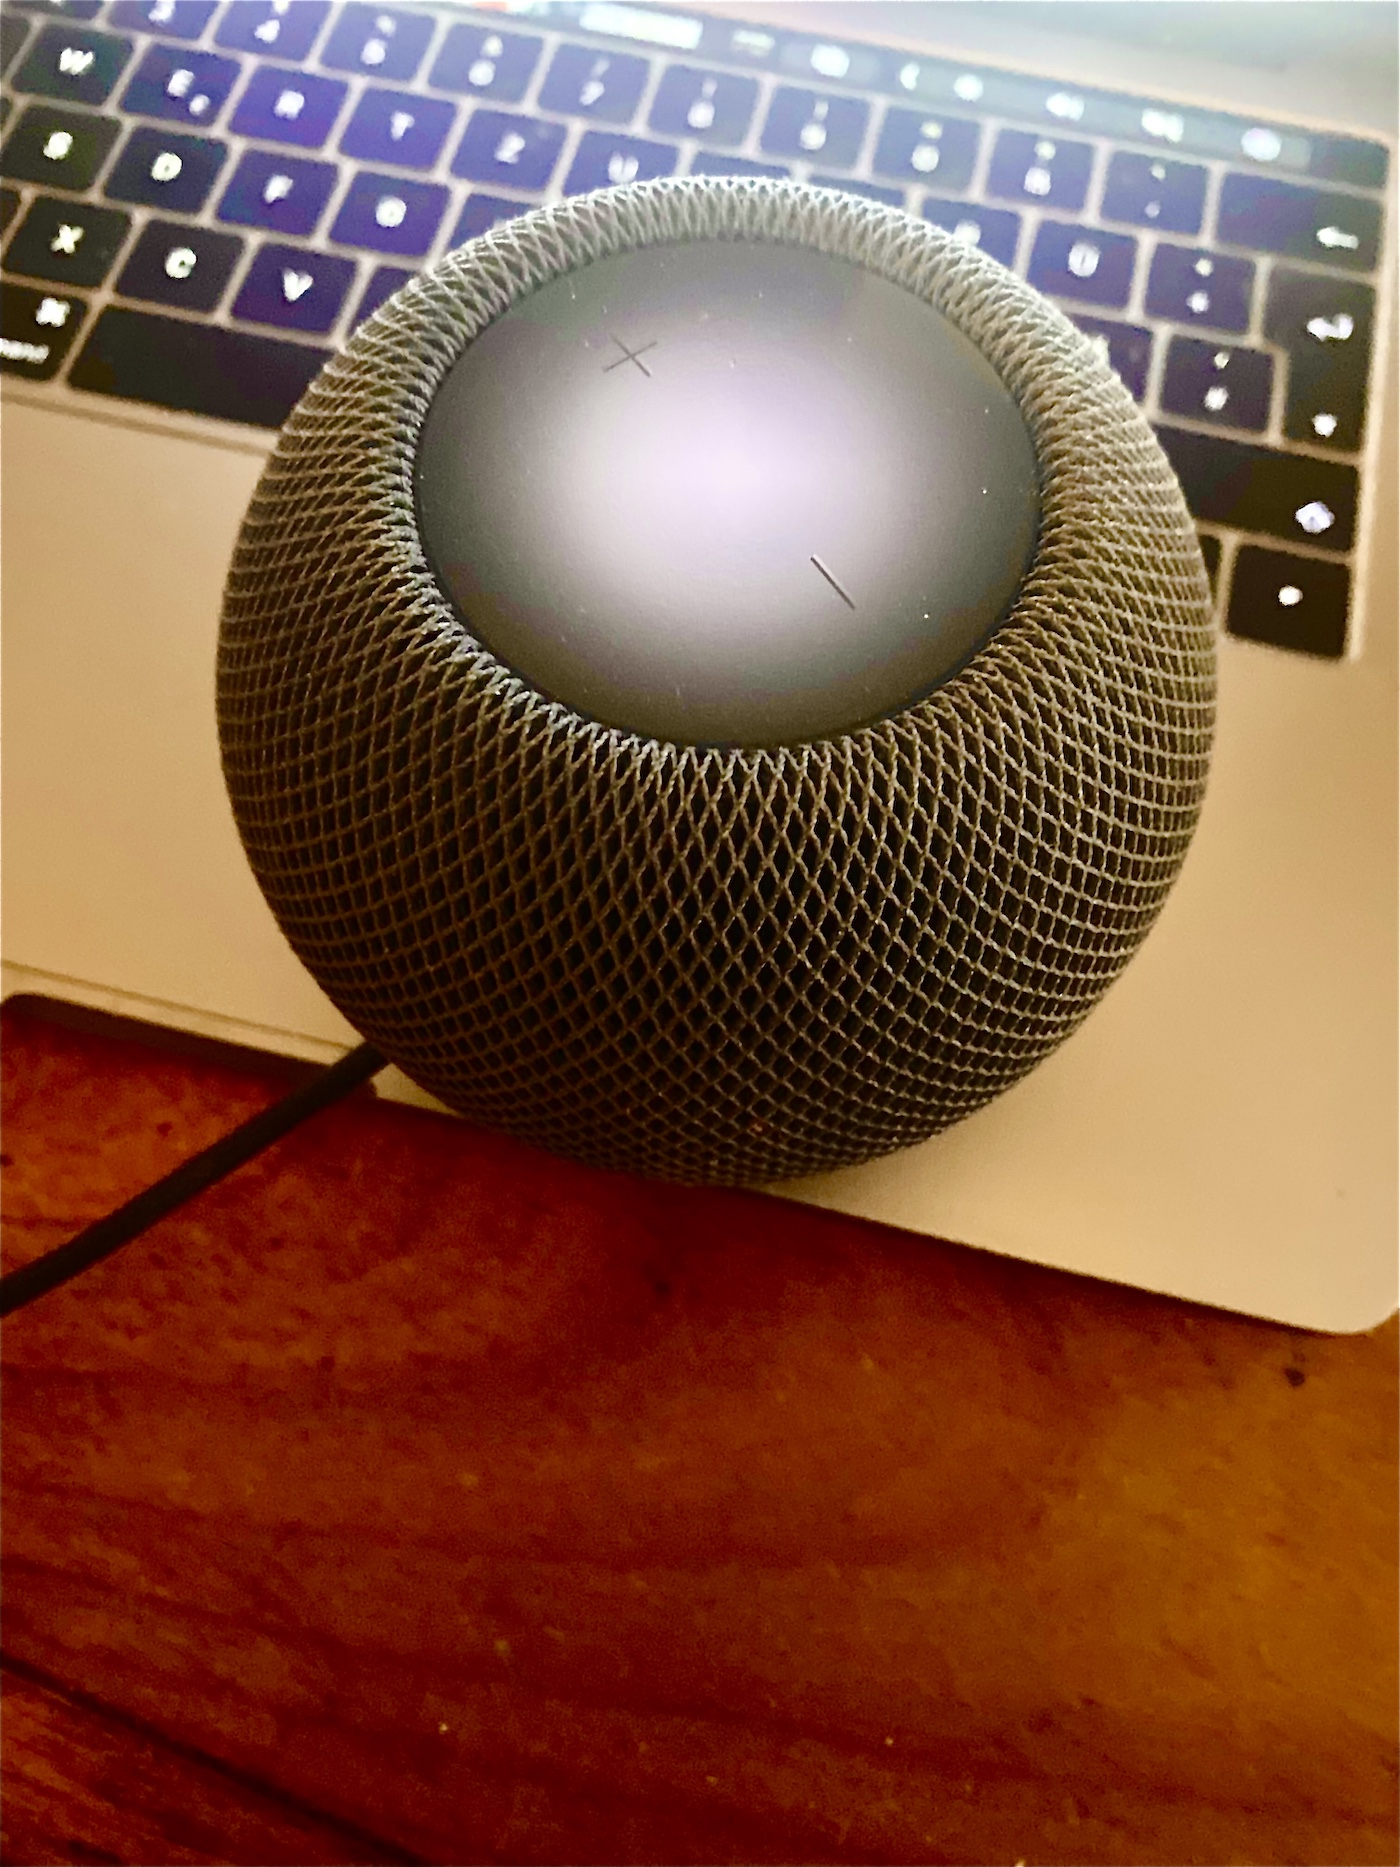 Hörgenuss mit dem Apple HomePod Mini erleben